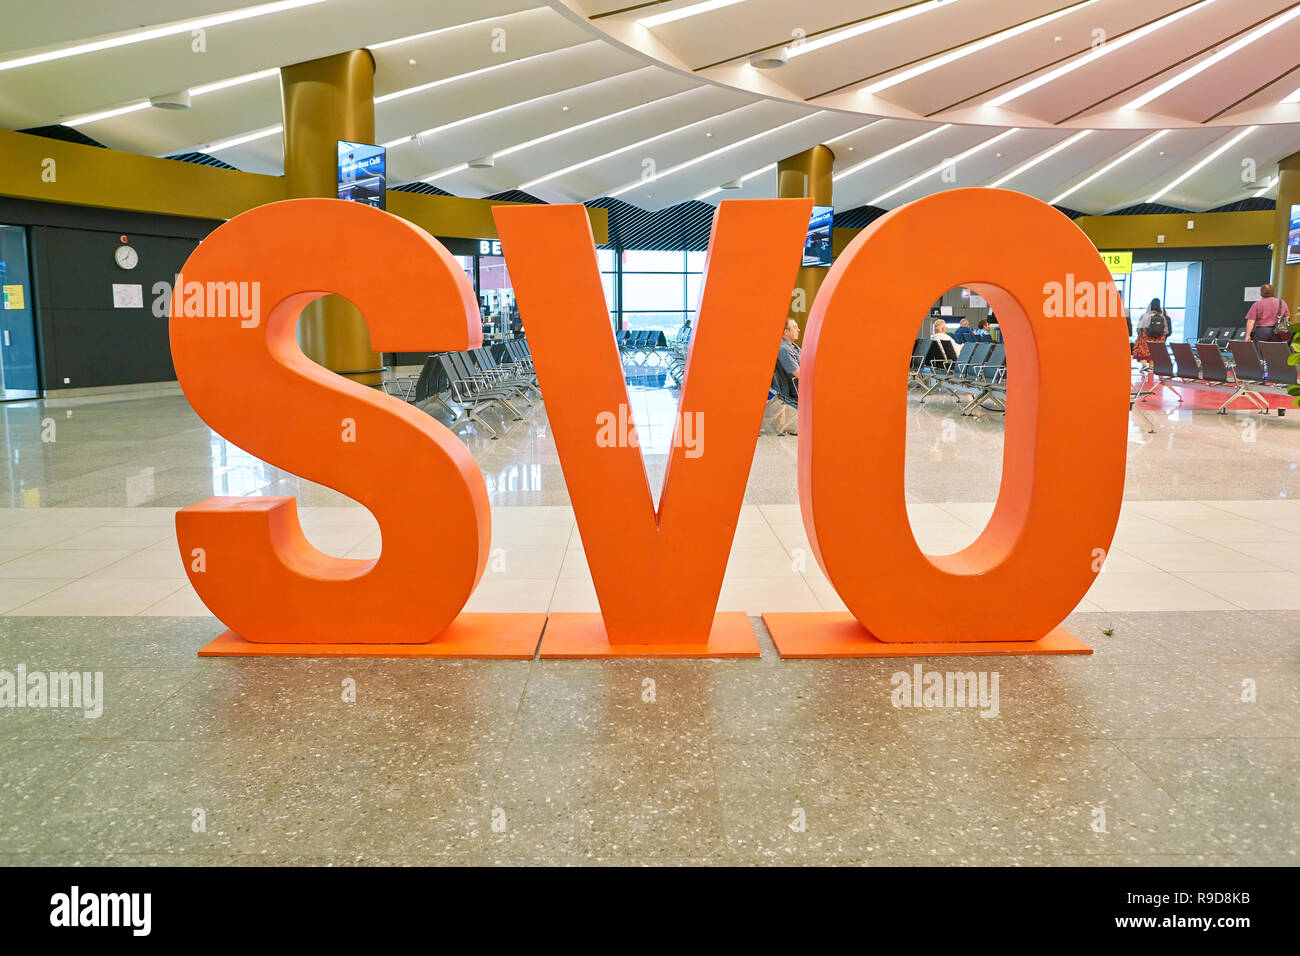 Svo Stock Photos & Svo Stock Images Alamy